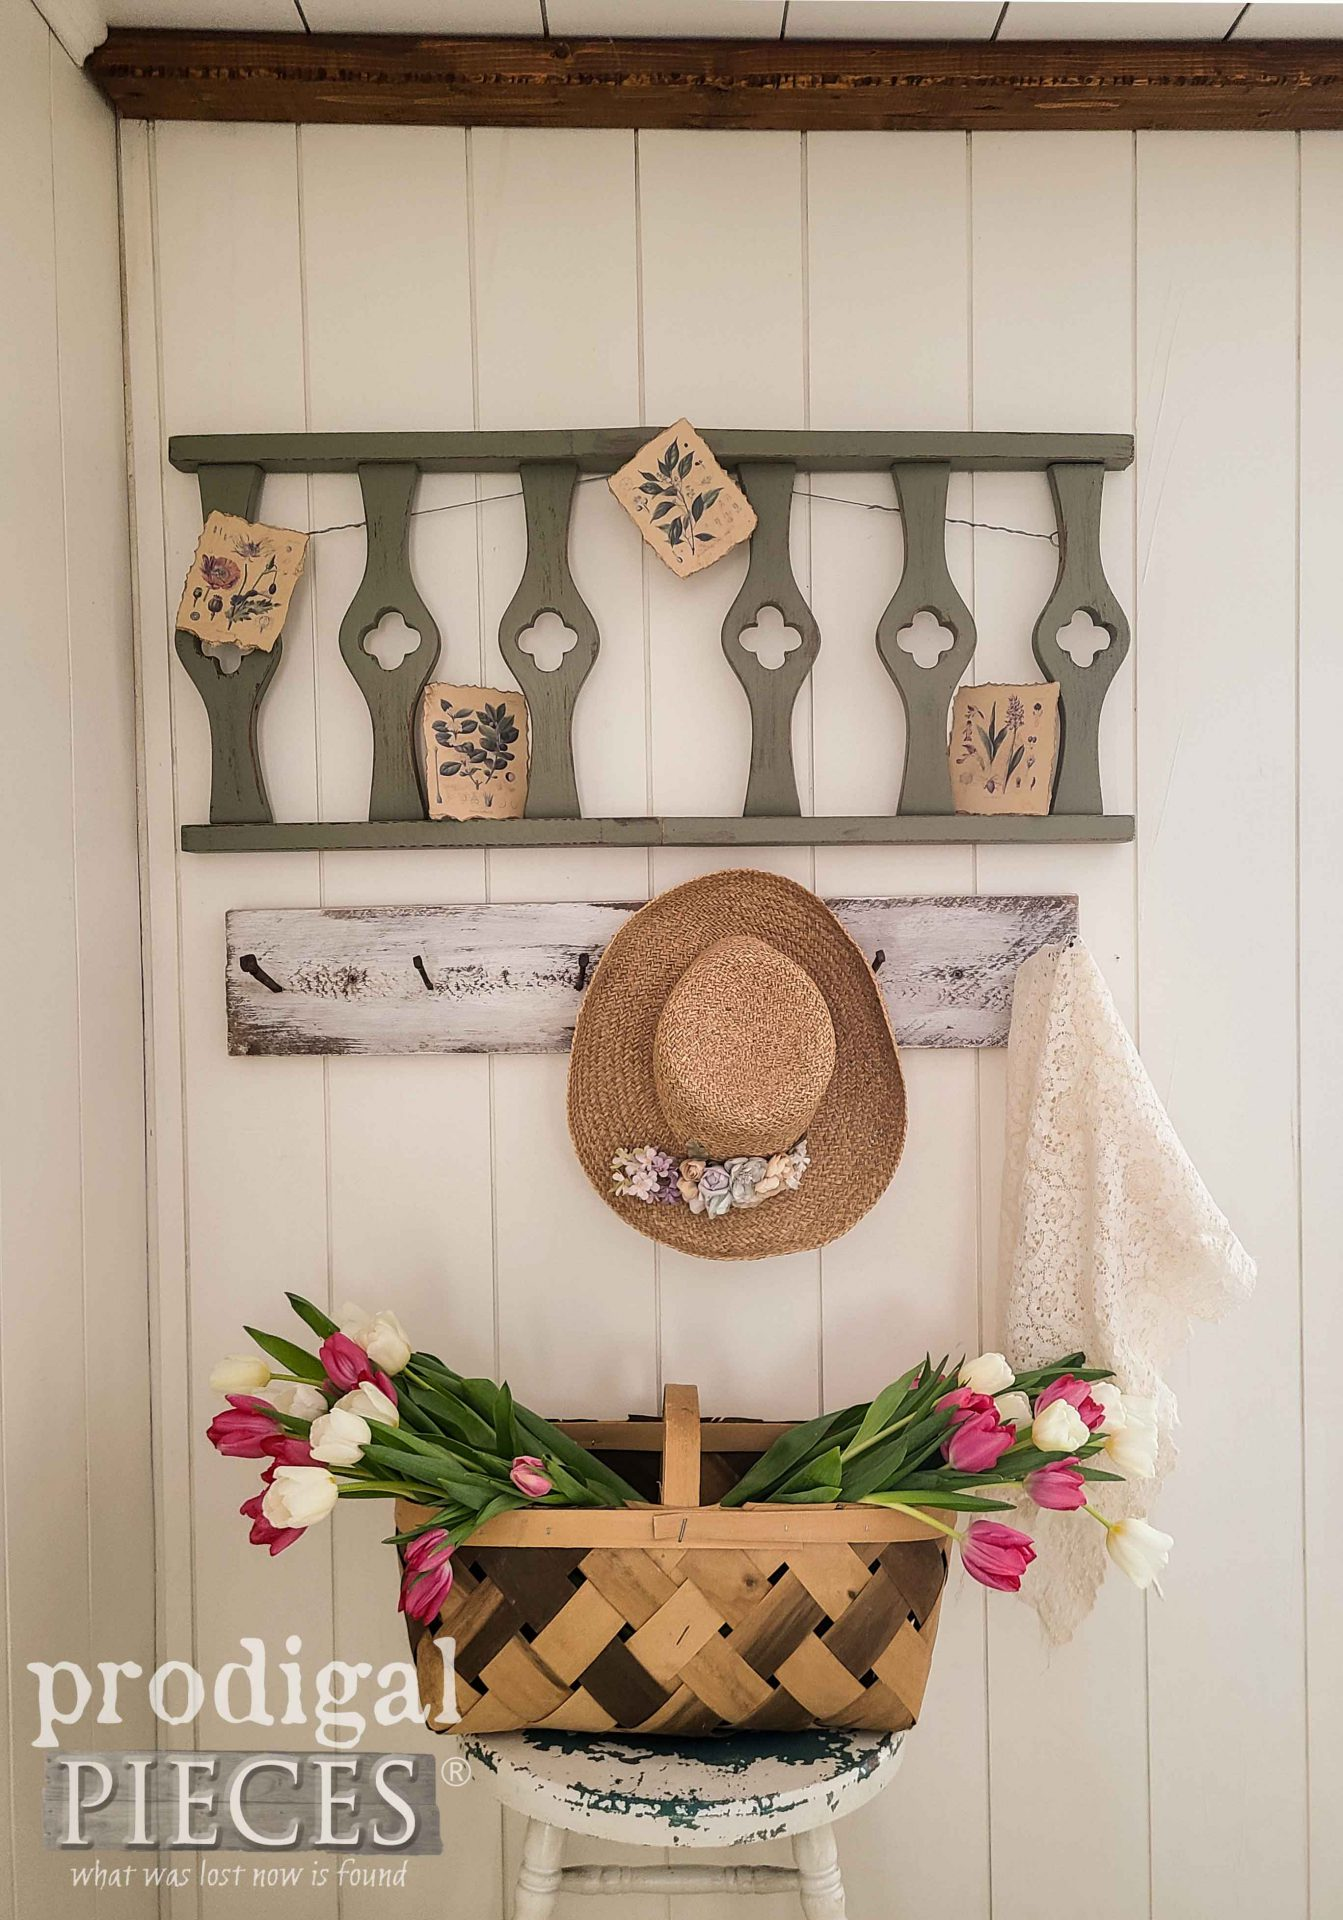 Farmhouse Salvaged Spring Art Decor by Larissa of Prodigal Pieces | prodigalpieces.com #prodigalpieces #diy #salvaged #vintage #farmhouse #home #homedecor